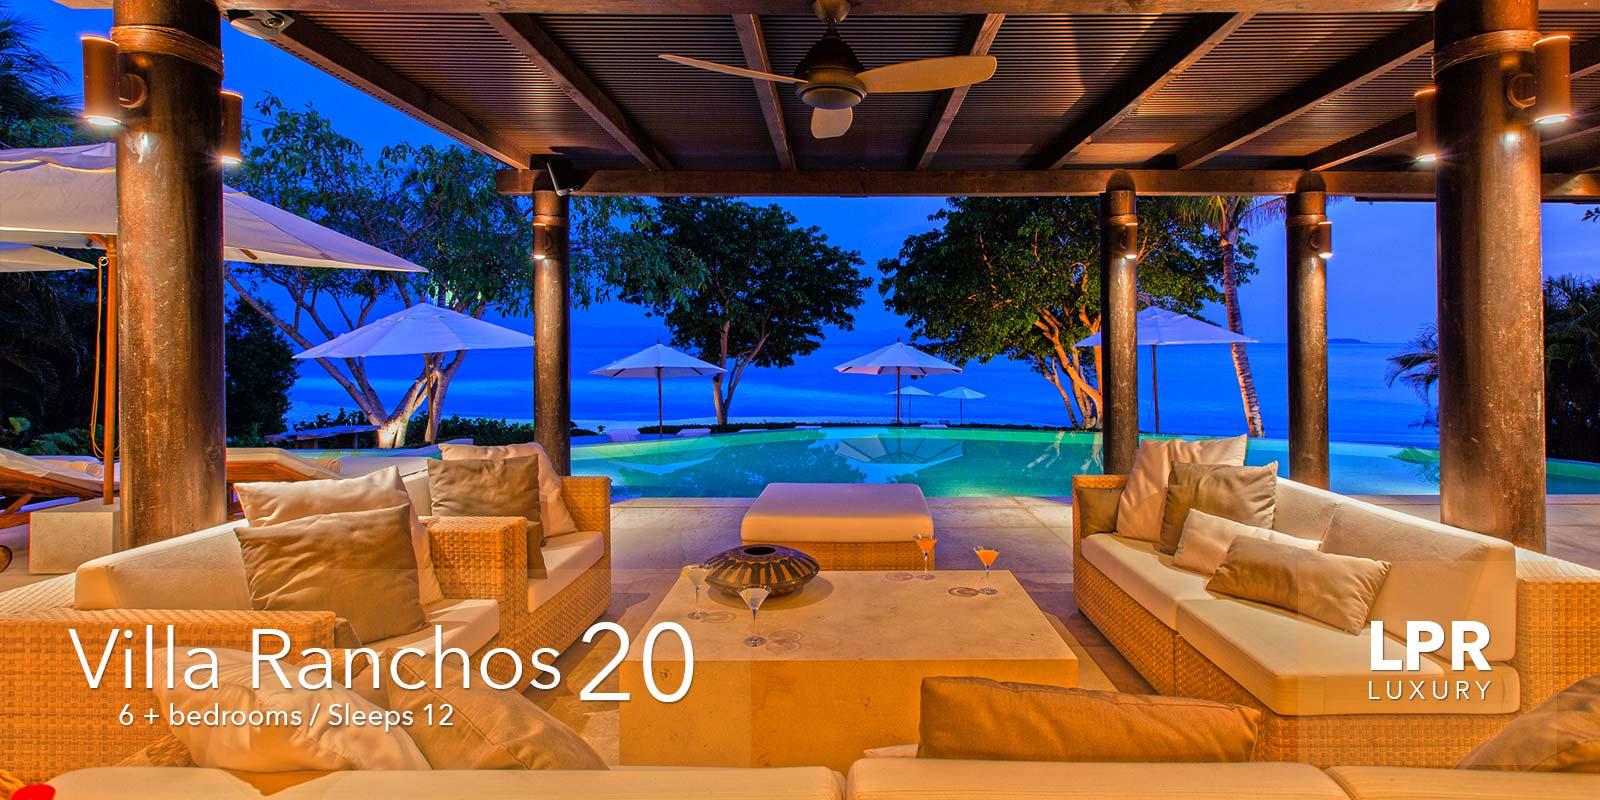 Villa Ranchos 20 - on the exquisitely private Ranchos beach at the Punta Mita Resort, Riviera Nayarit, Mexico